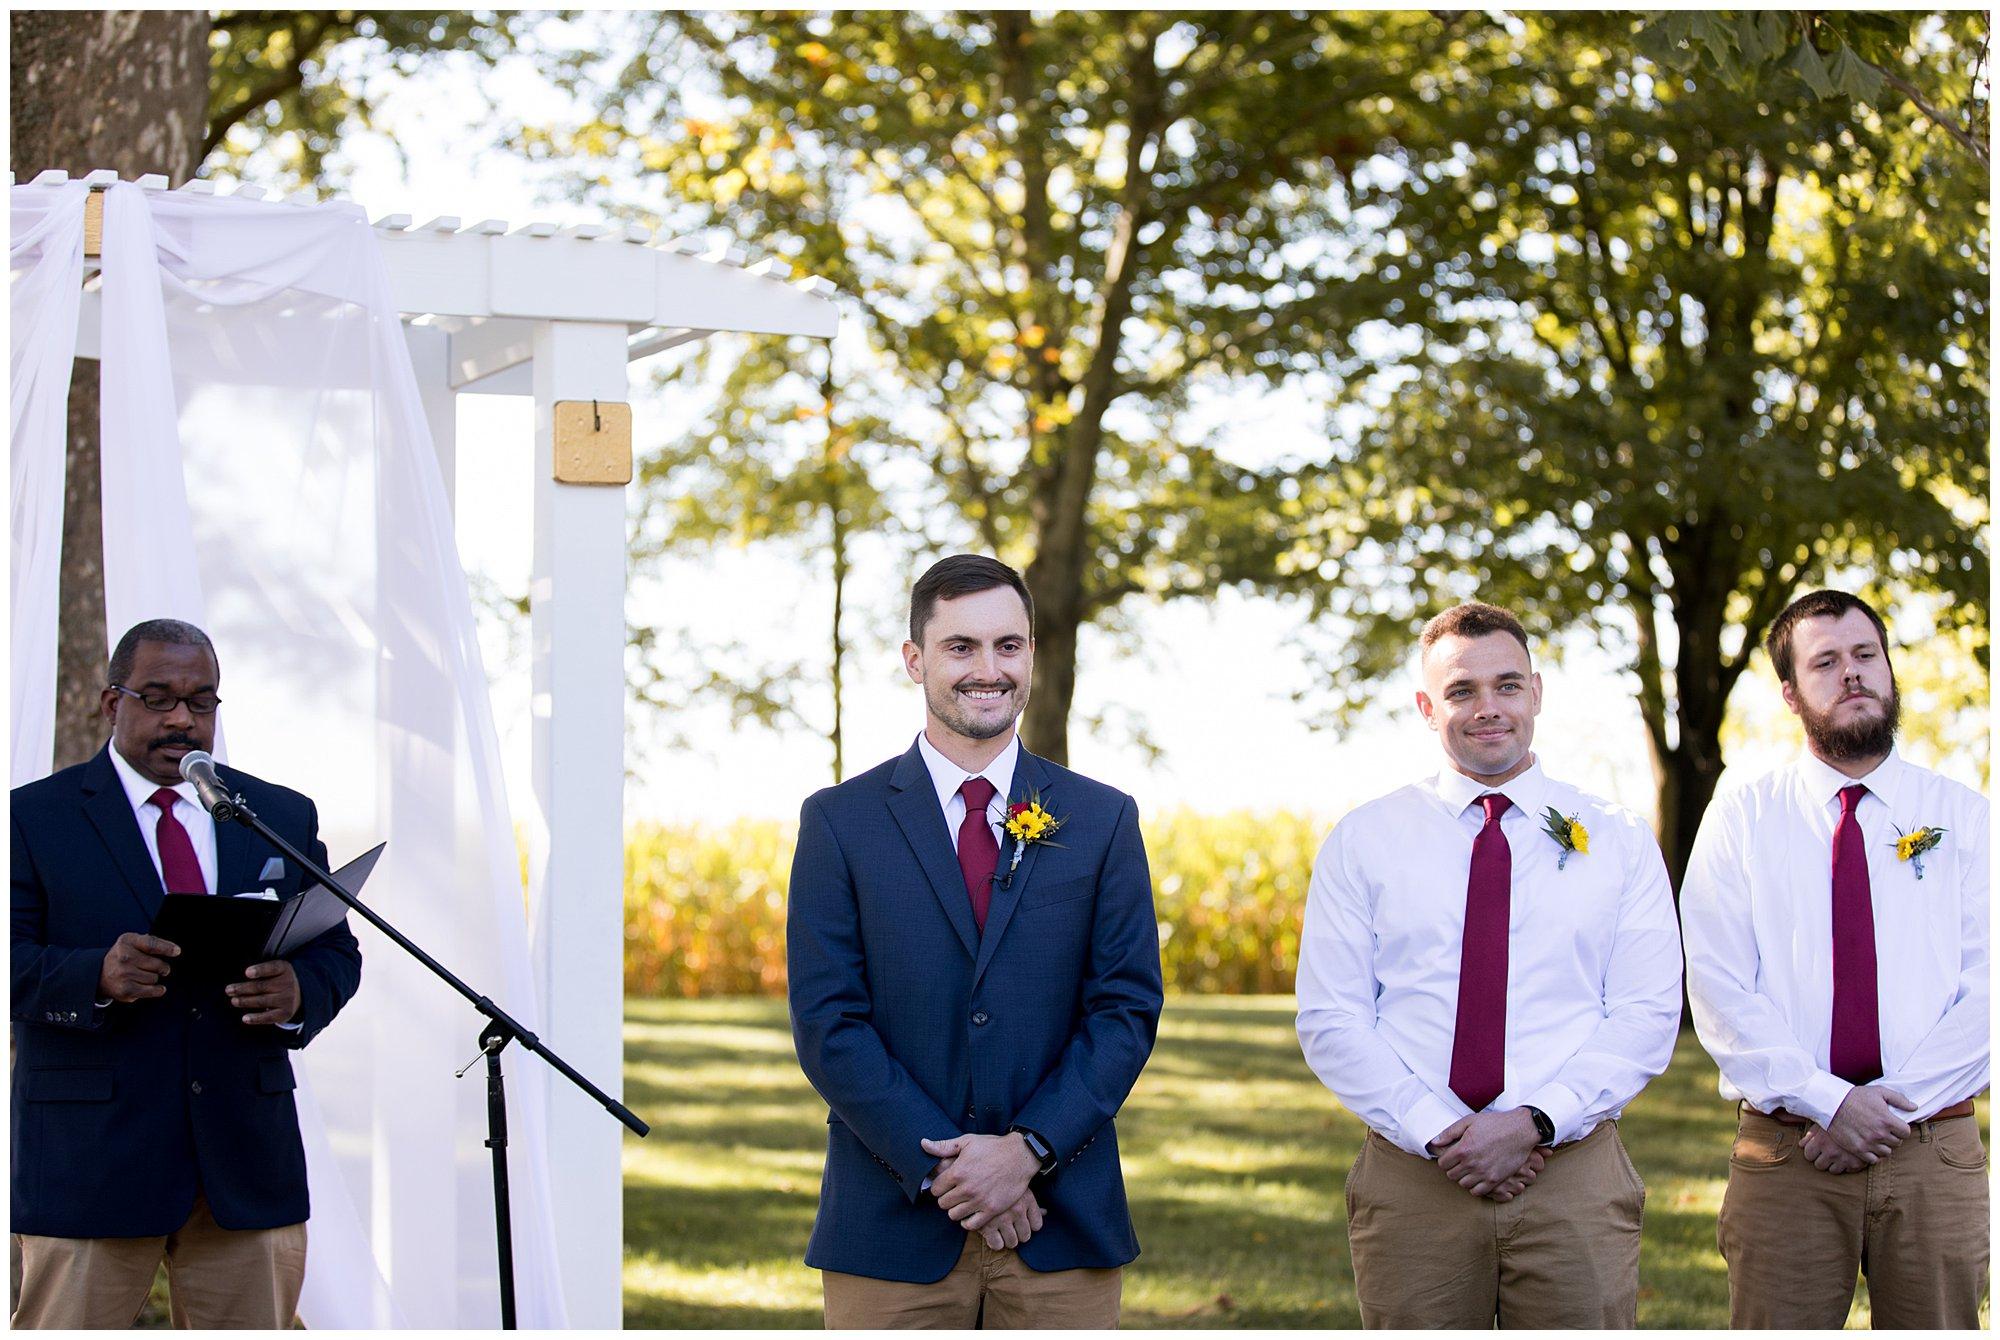 groom smiles as bride comes down wedding aisle at Legacy Barn in Kokomo